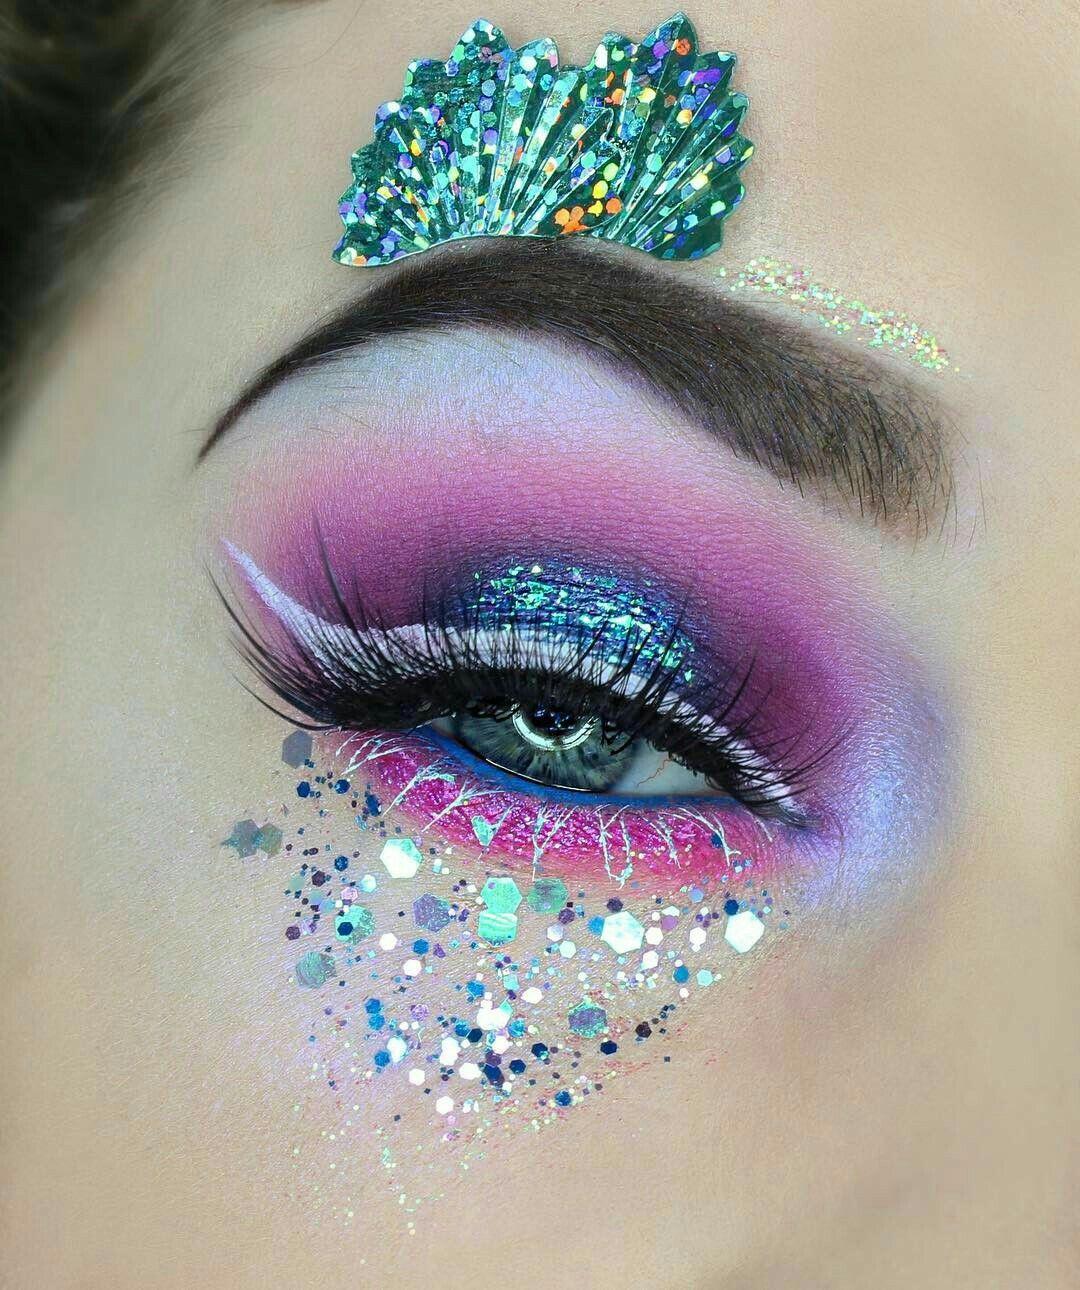 Twinkle Loose Glitter Eyeshadow Loose glitter eyeshadow